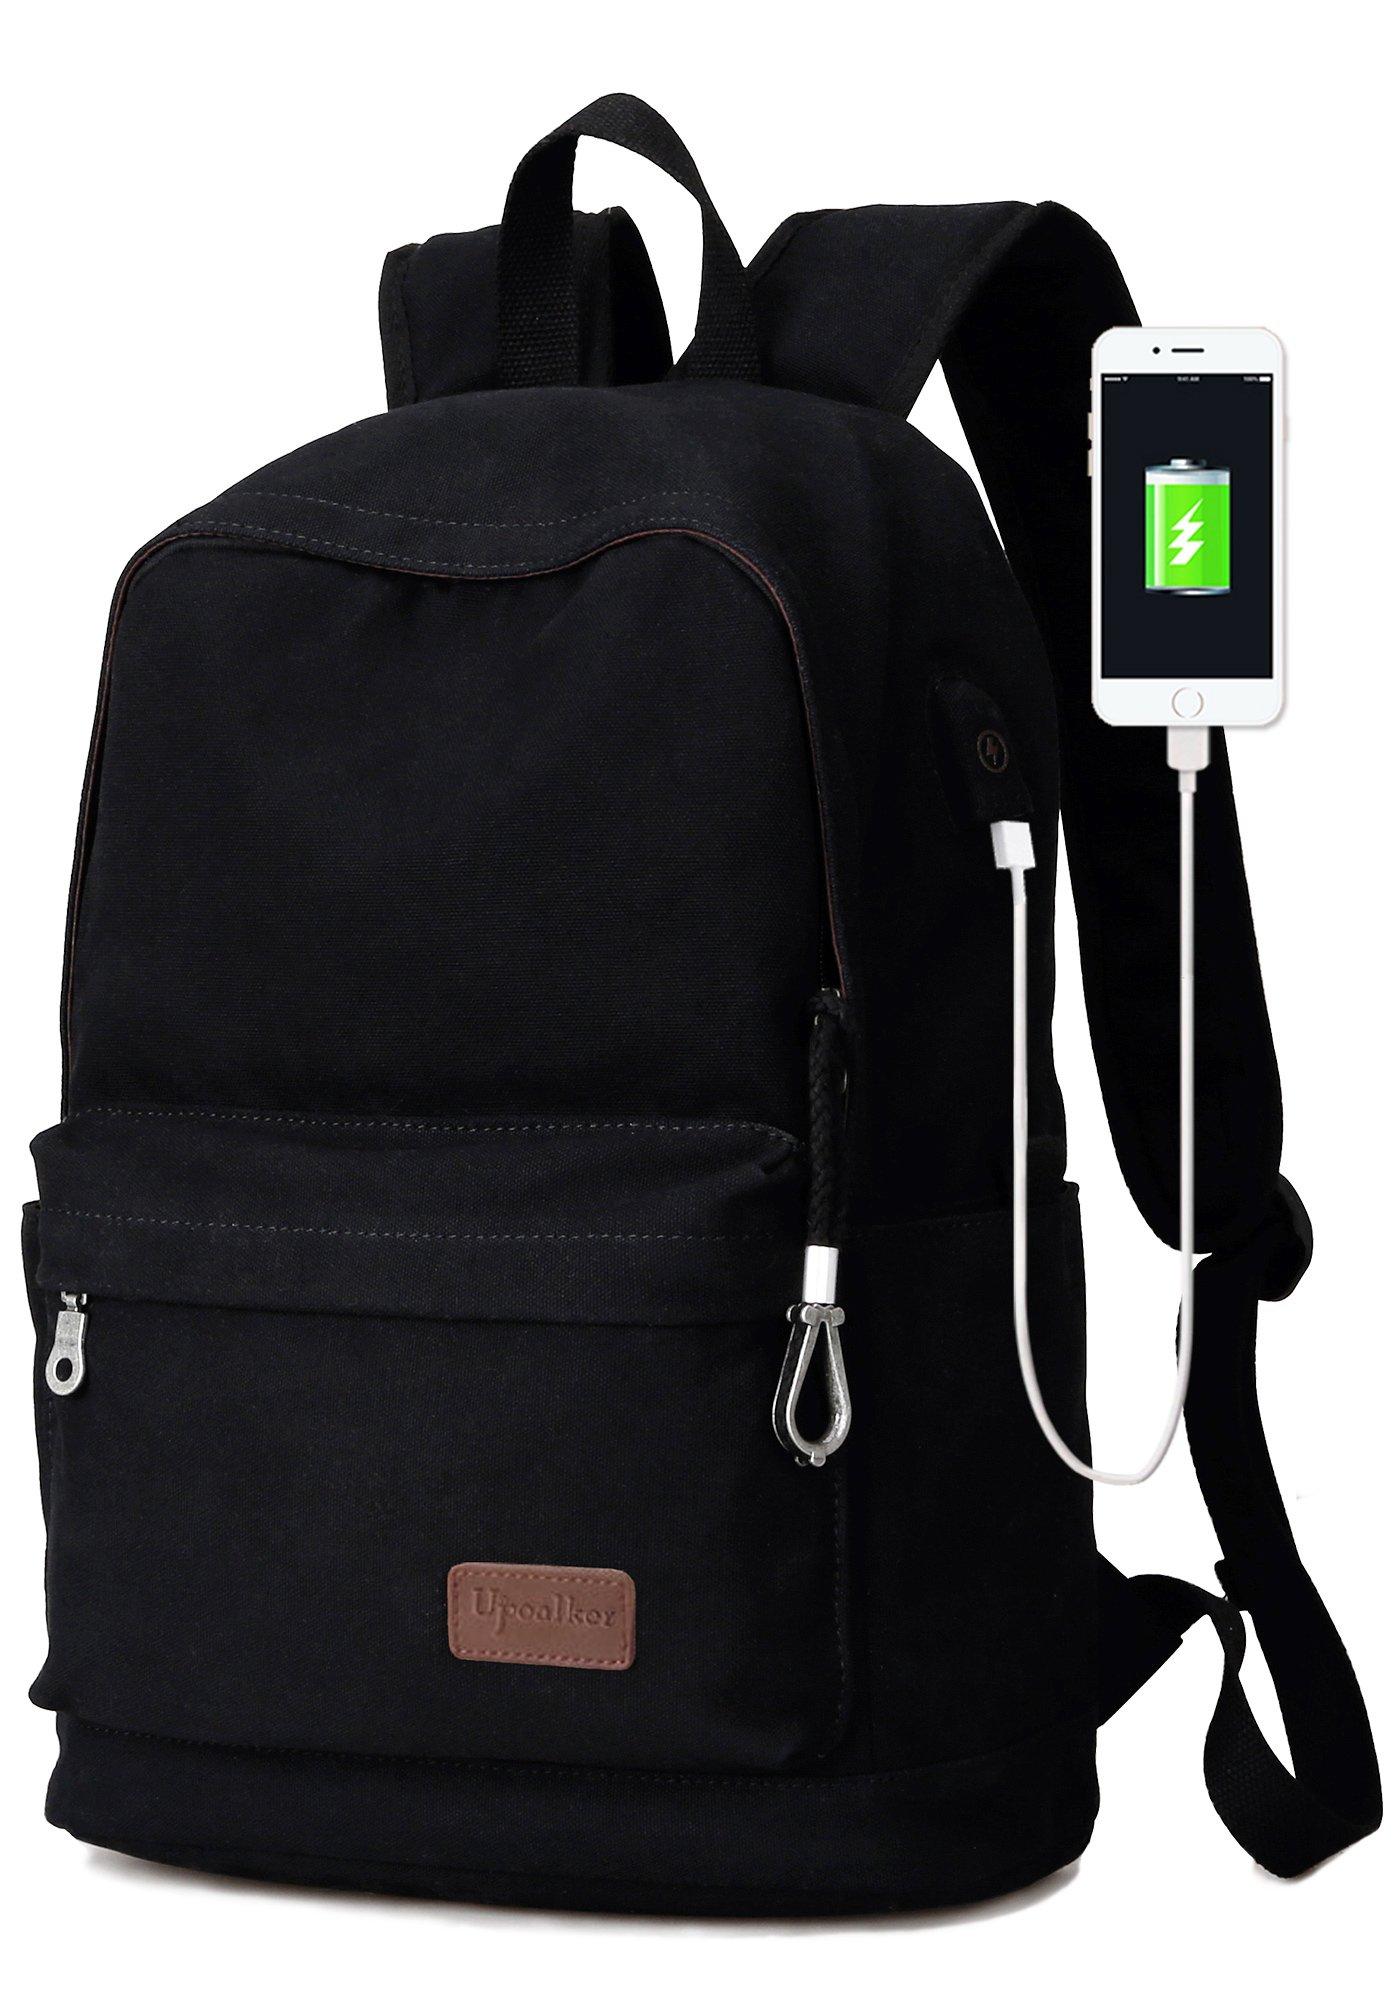 Upoalker Canvas Backpack with USB Charging Port for School Bookbag Travel Rucksack for Fits up to 15.6 inch Laptop Bag (Black)